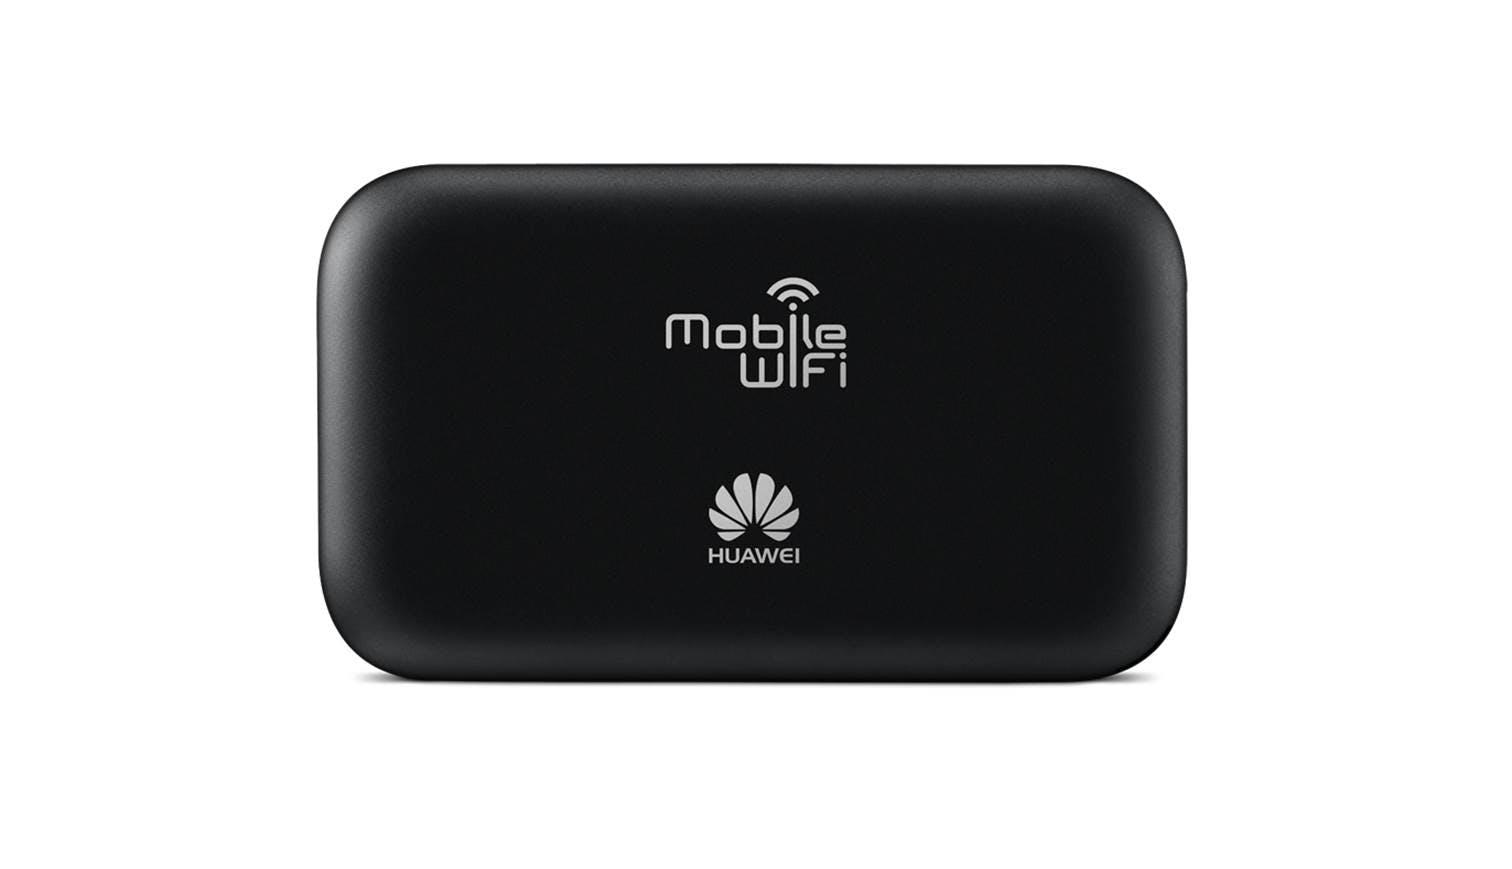 Huawei HW-E5573S LTE 4G Cat4 Mobile Wi-Fi 1500mAh Router